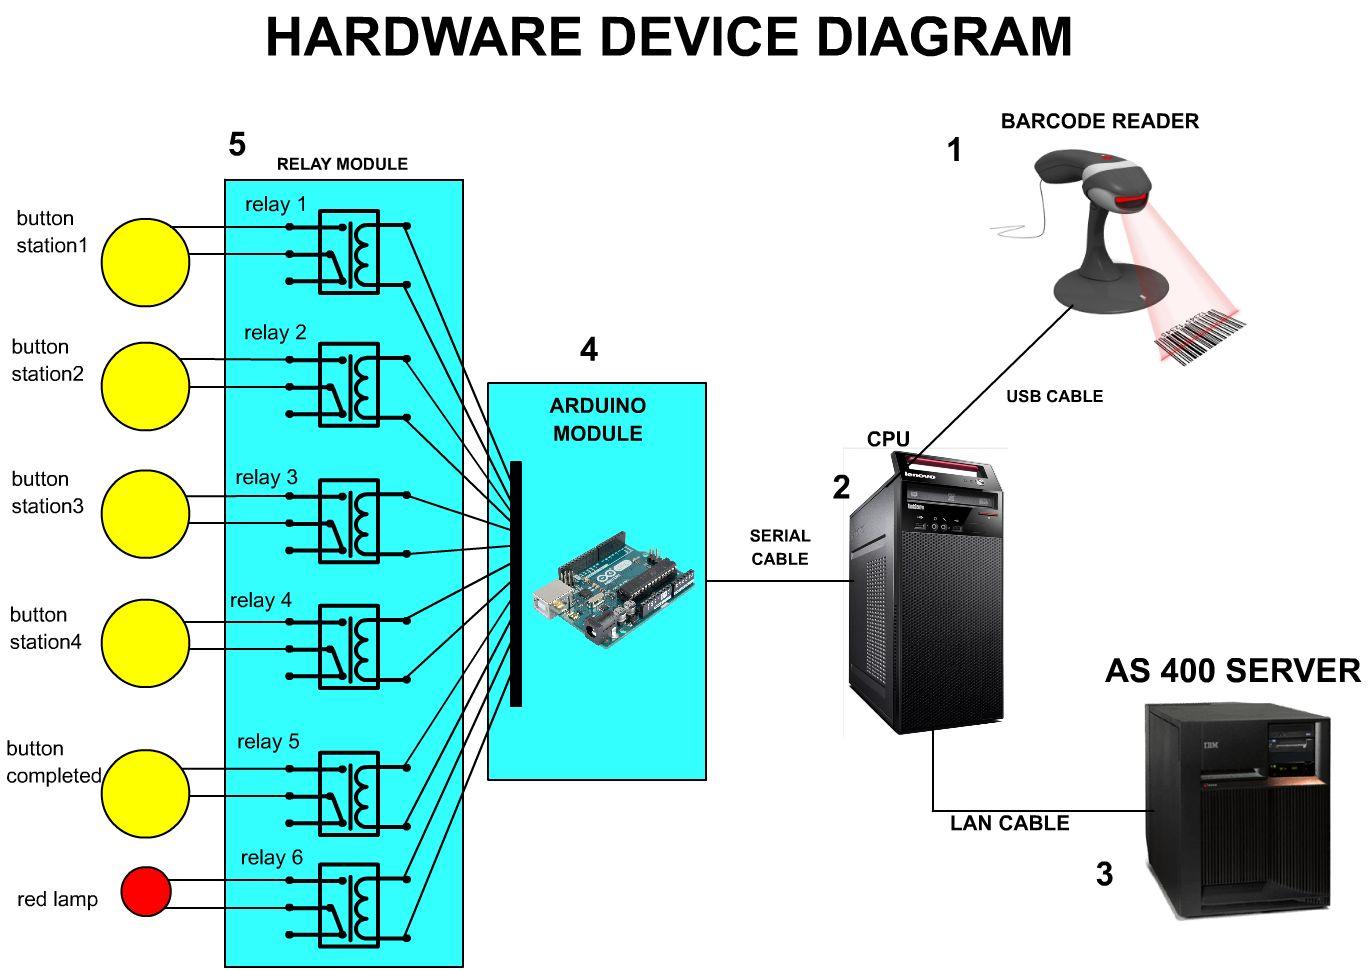 Hardware diagram rrm3odz04d